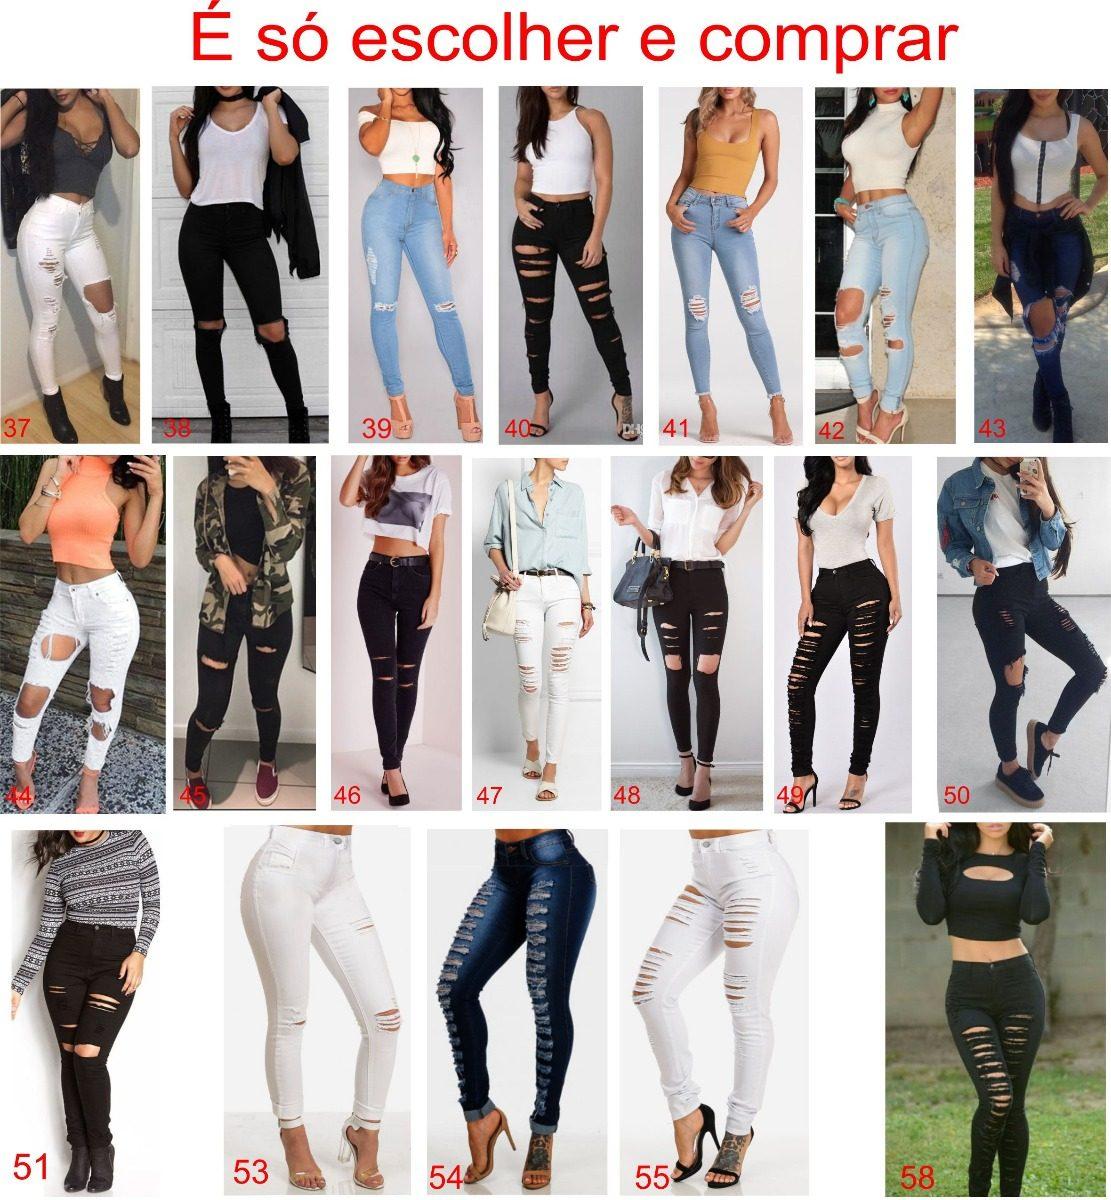 4f13bdc74 Carregando zoom... roupa feminina calça jeans rasgada cintura alta branca  dins